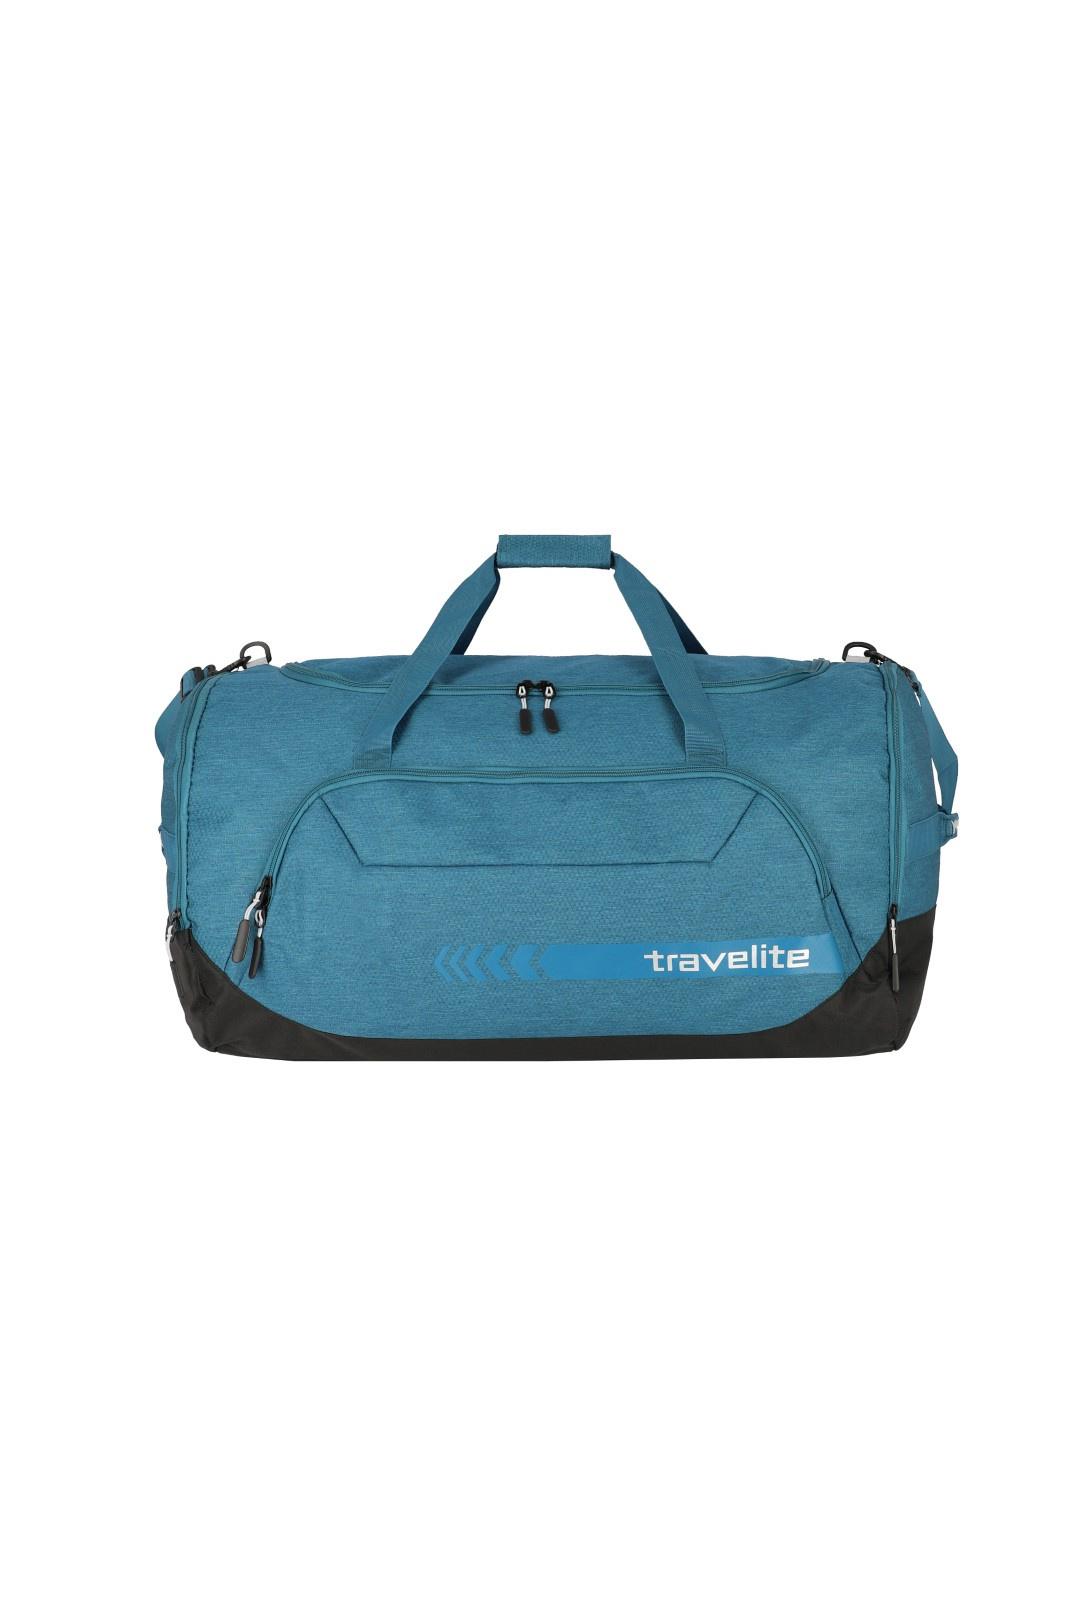 Travelite KICK OFF Duffle XL 006916 Petrol